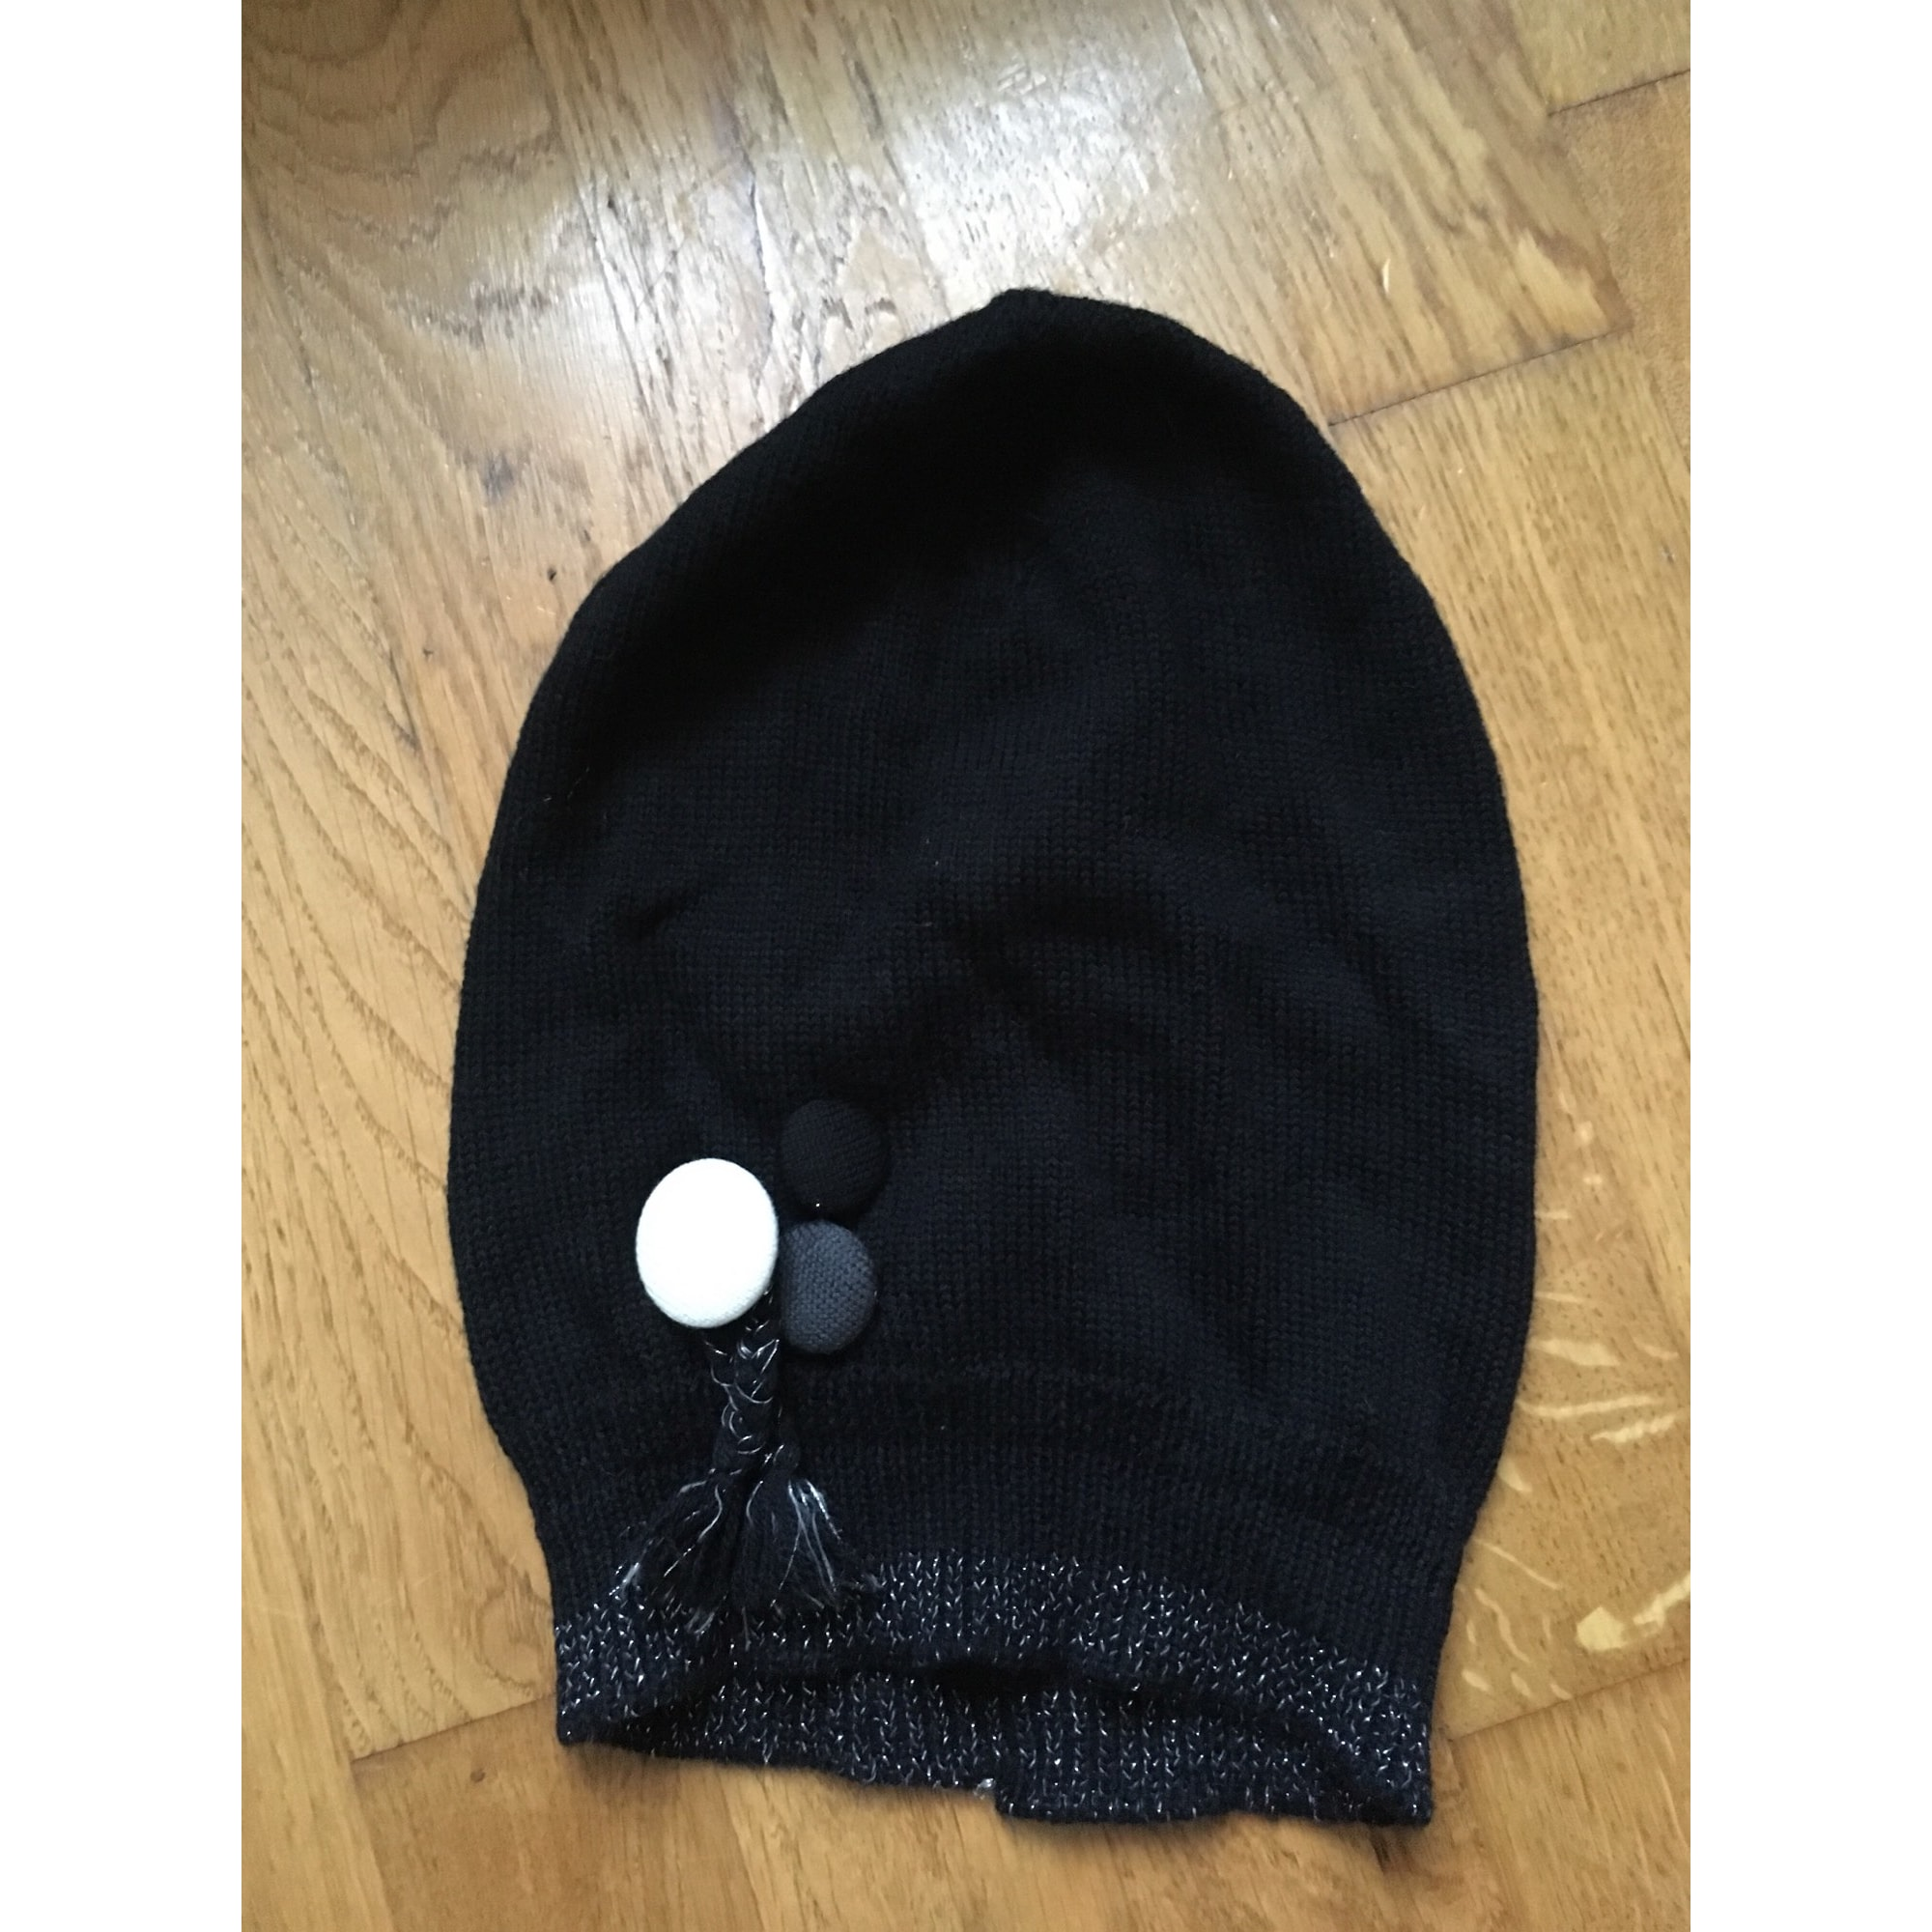 Bonnet BEL AIR Noir